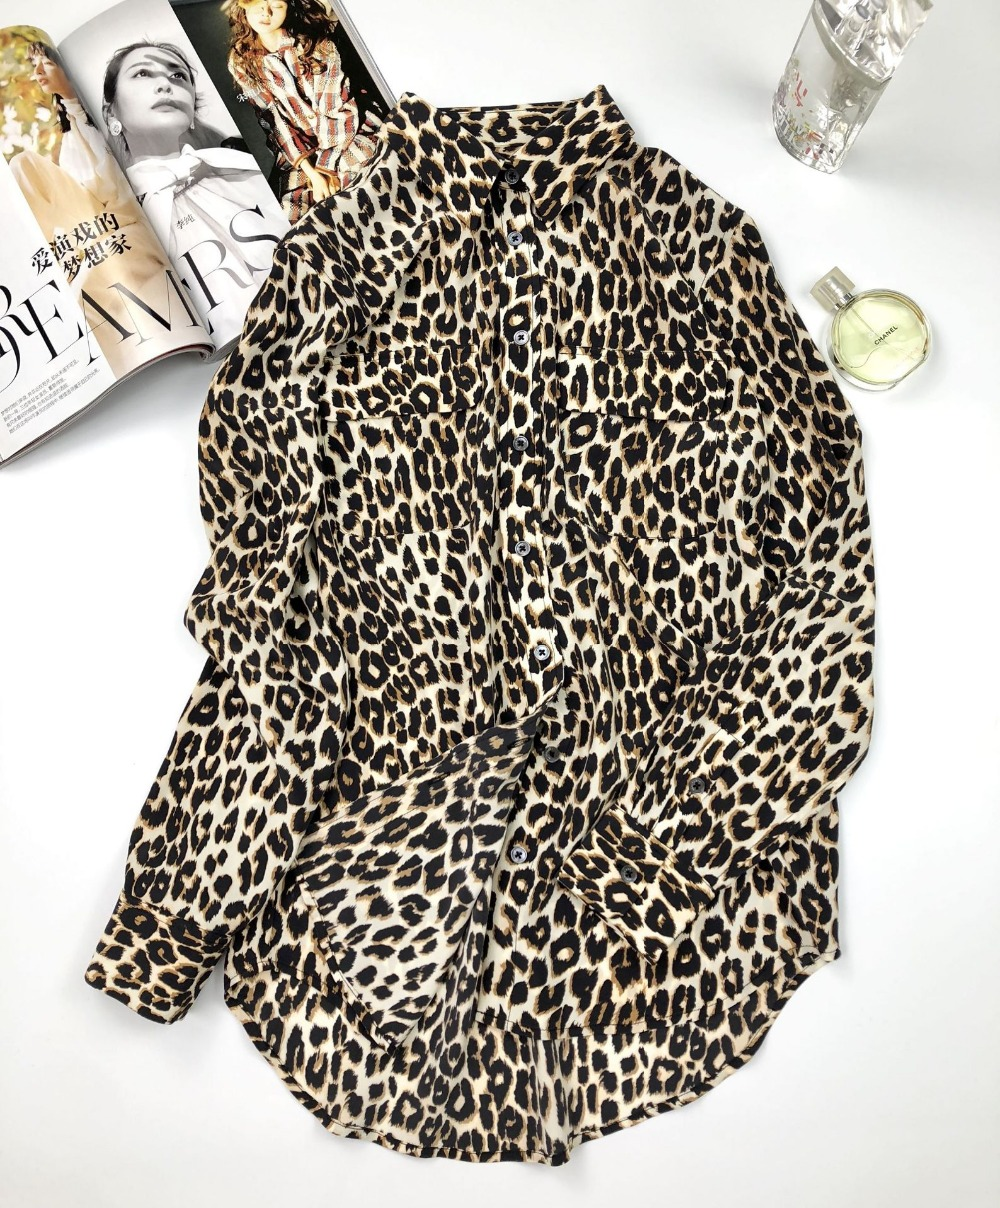 100% natural silk blouse animal print leopard shirt chiffon blusas women sexy v neck lady high quality runway blouse 2019 - 5